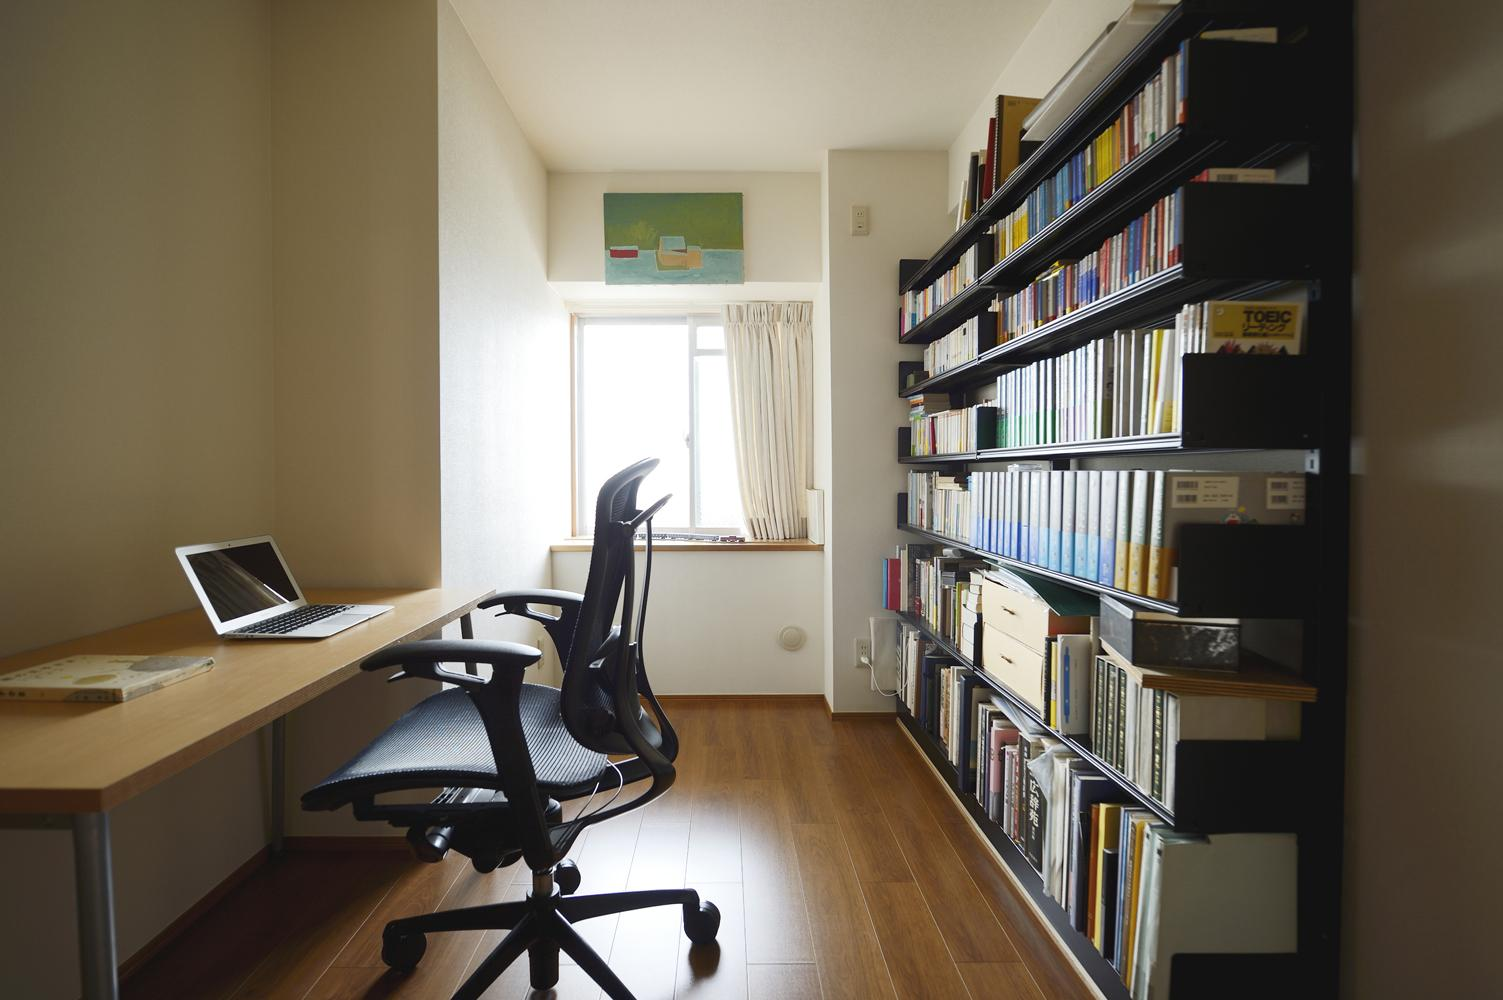 K邸・暮しを彩る収納のある家 (大容量壁面収納のある書斎)